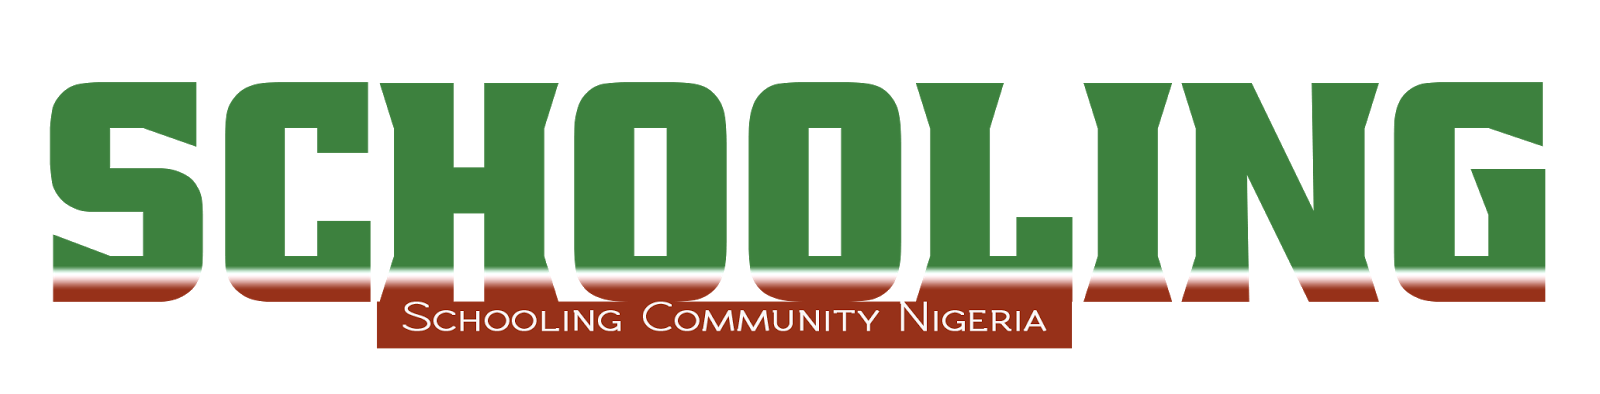 Schooling Community